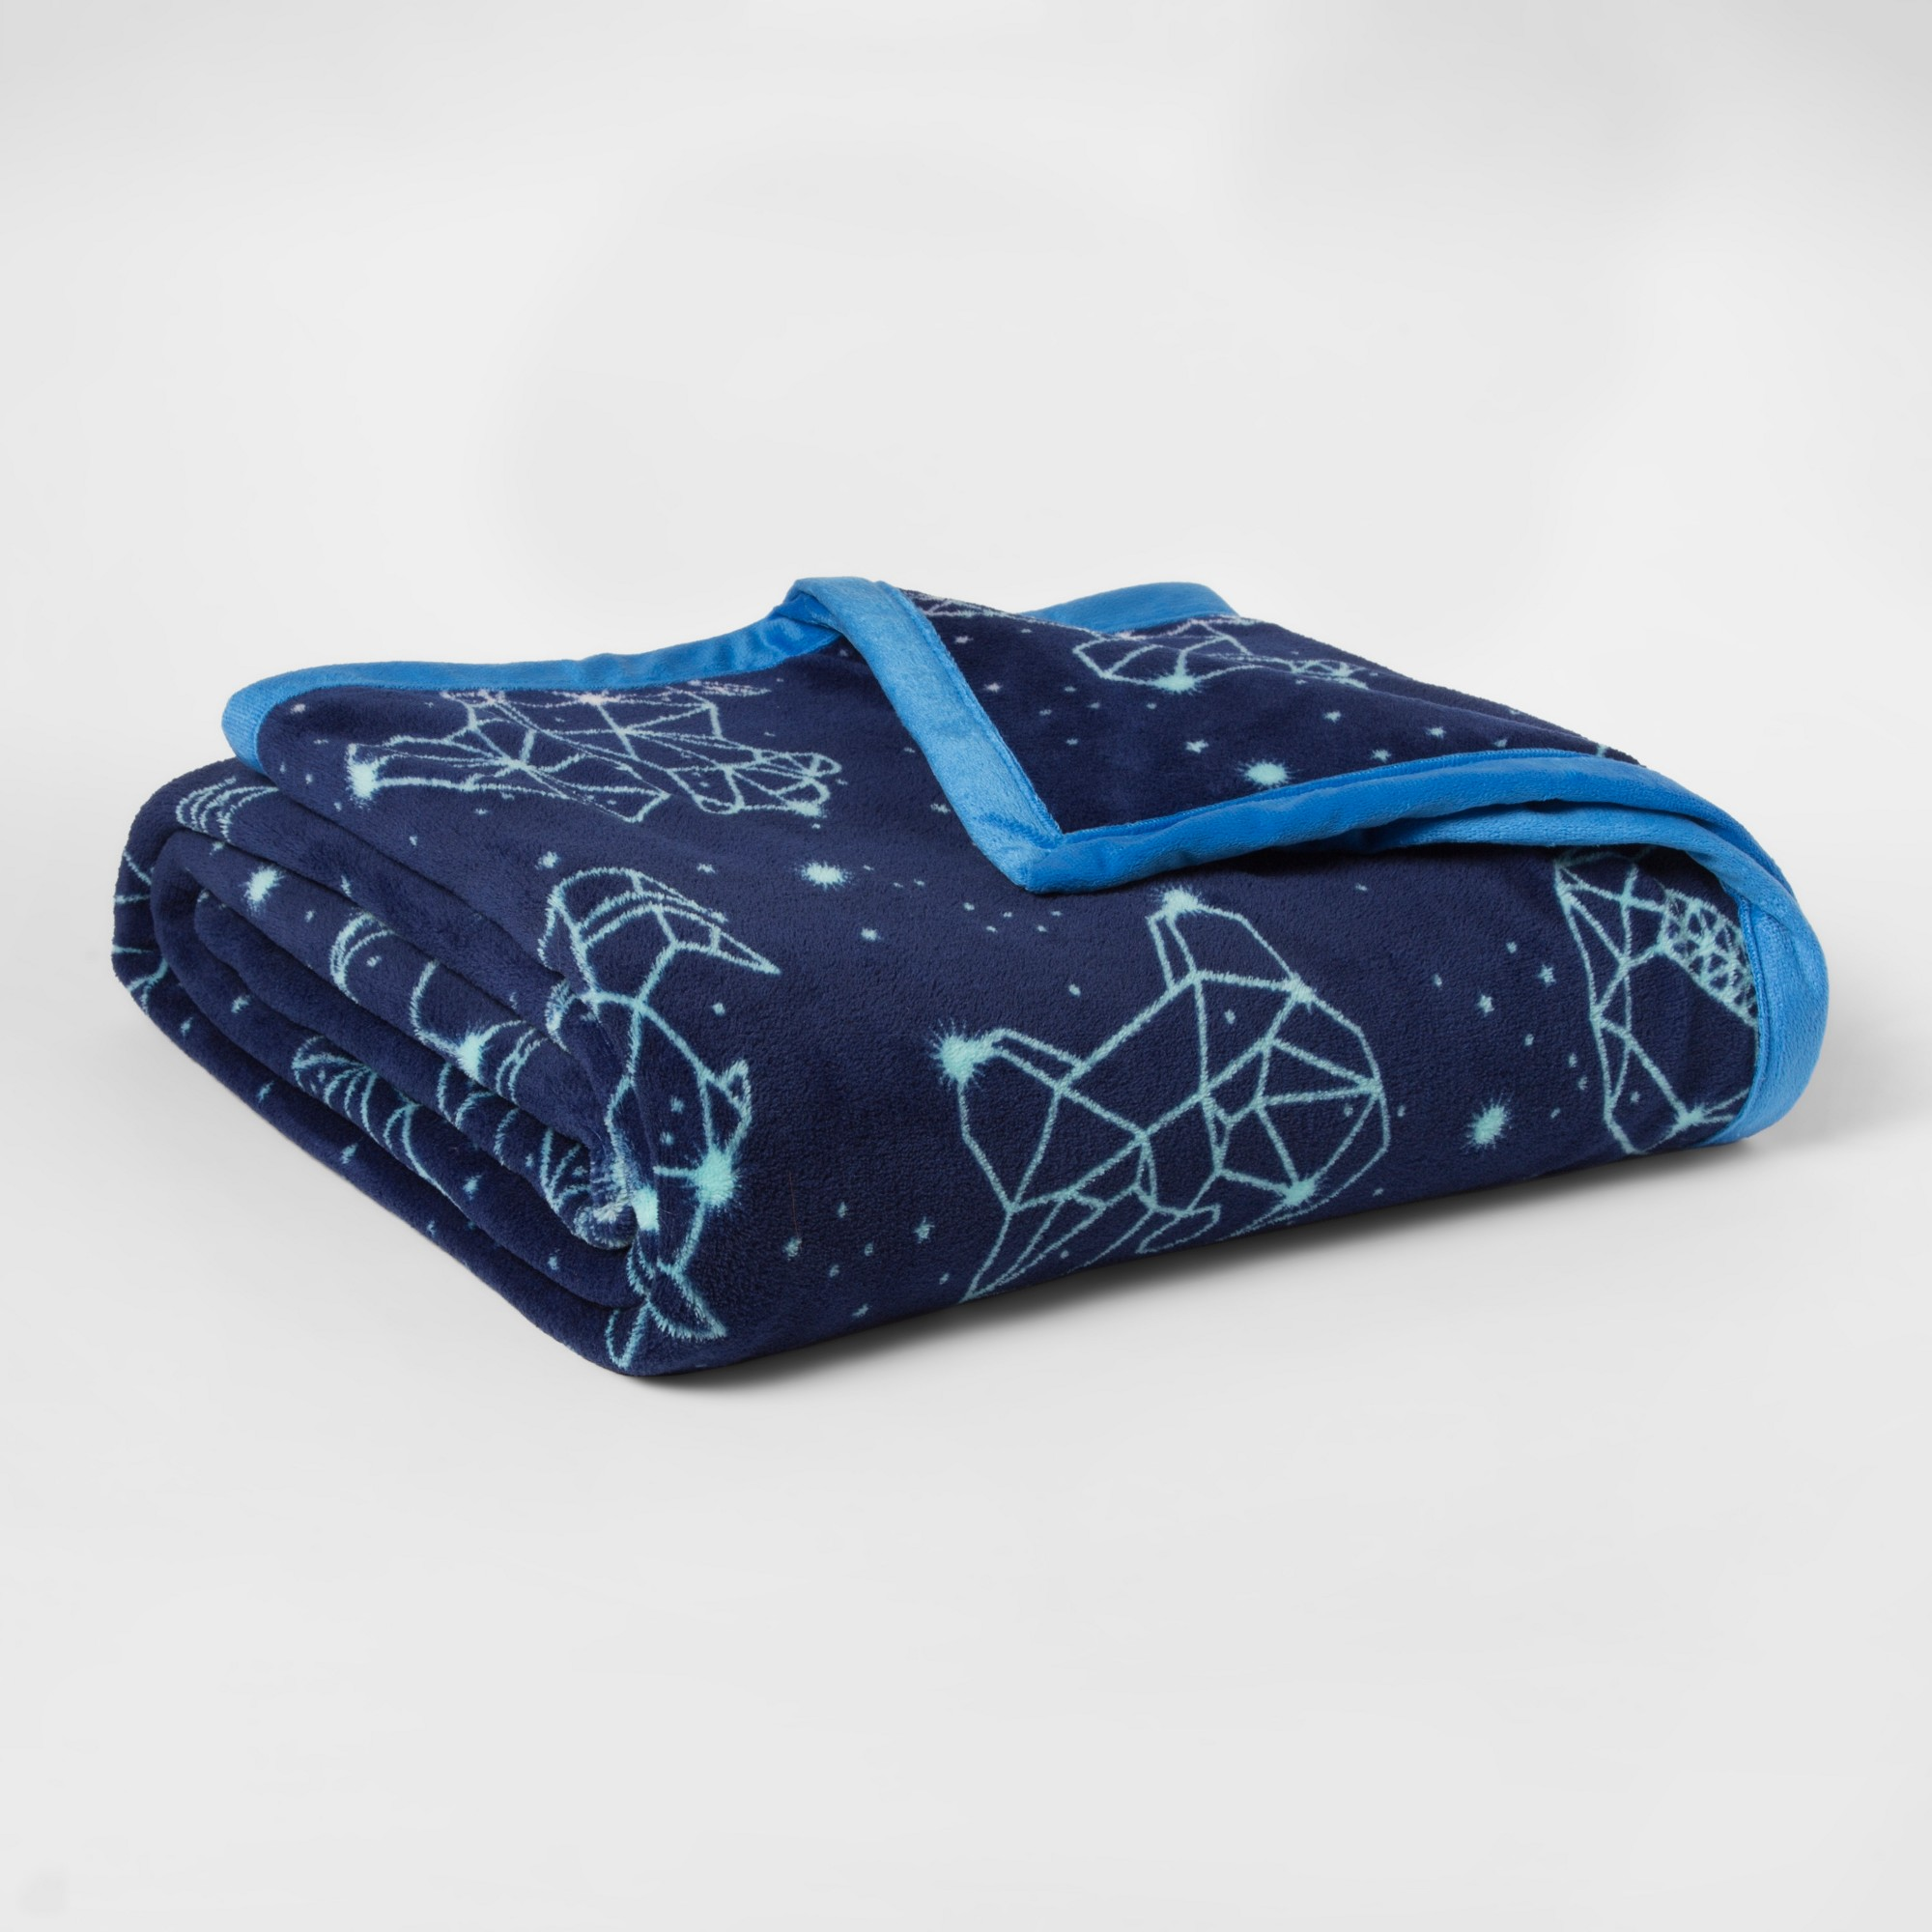 Constellations Plush Blanket (Twin) Pillowfort, Blue